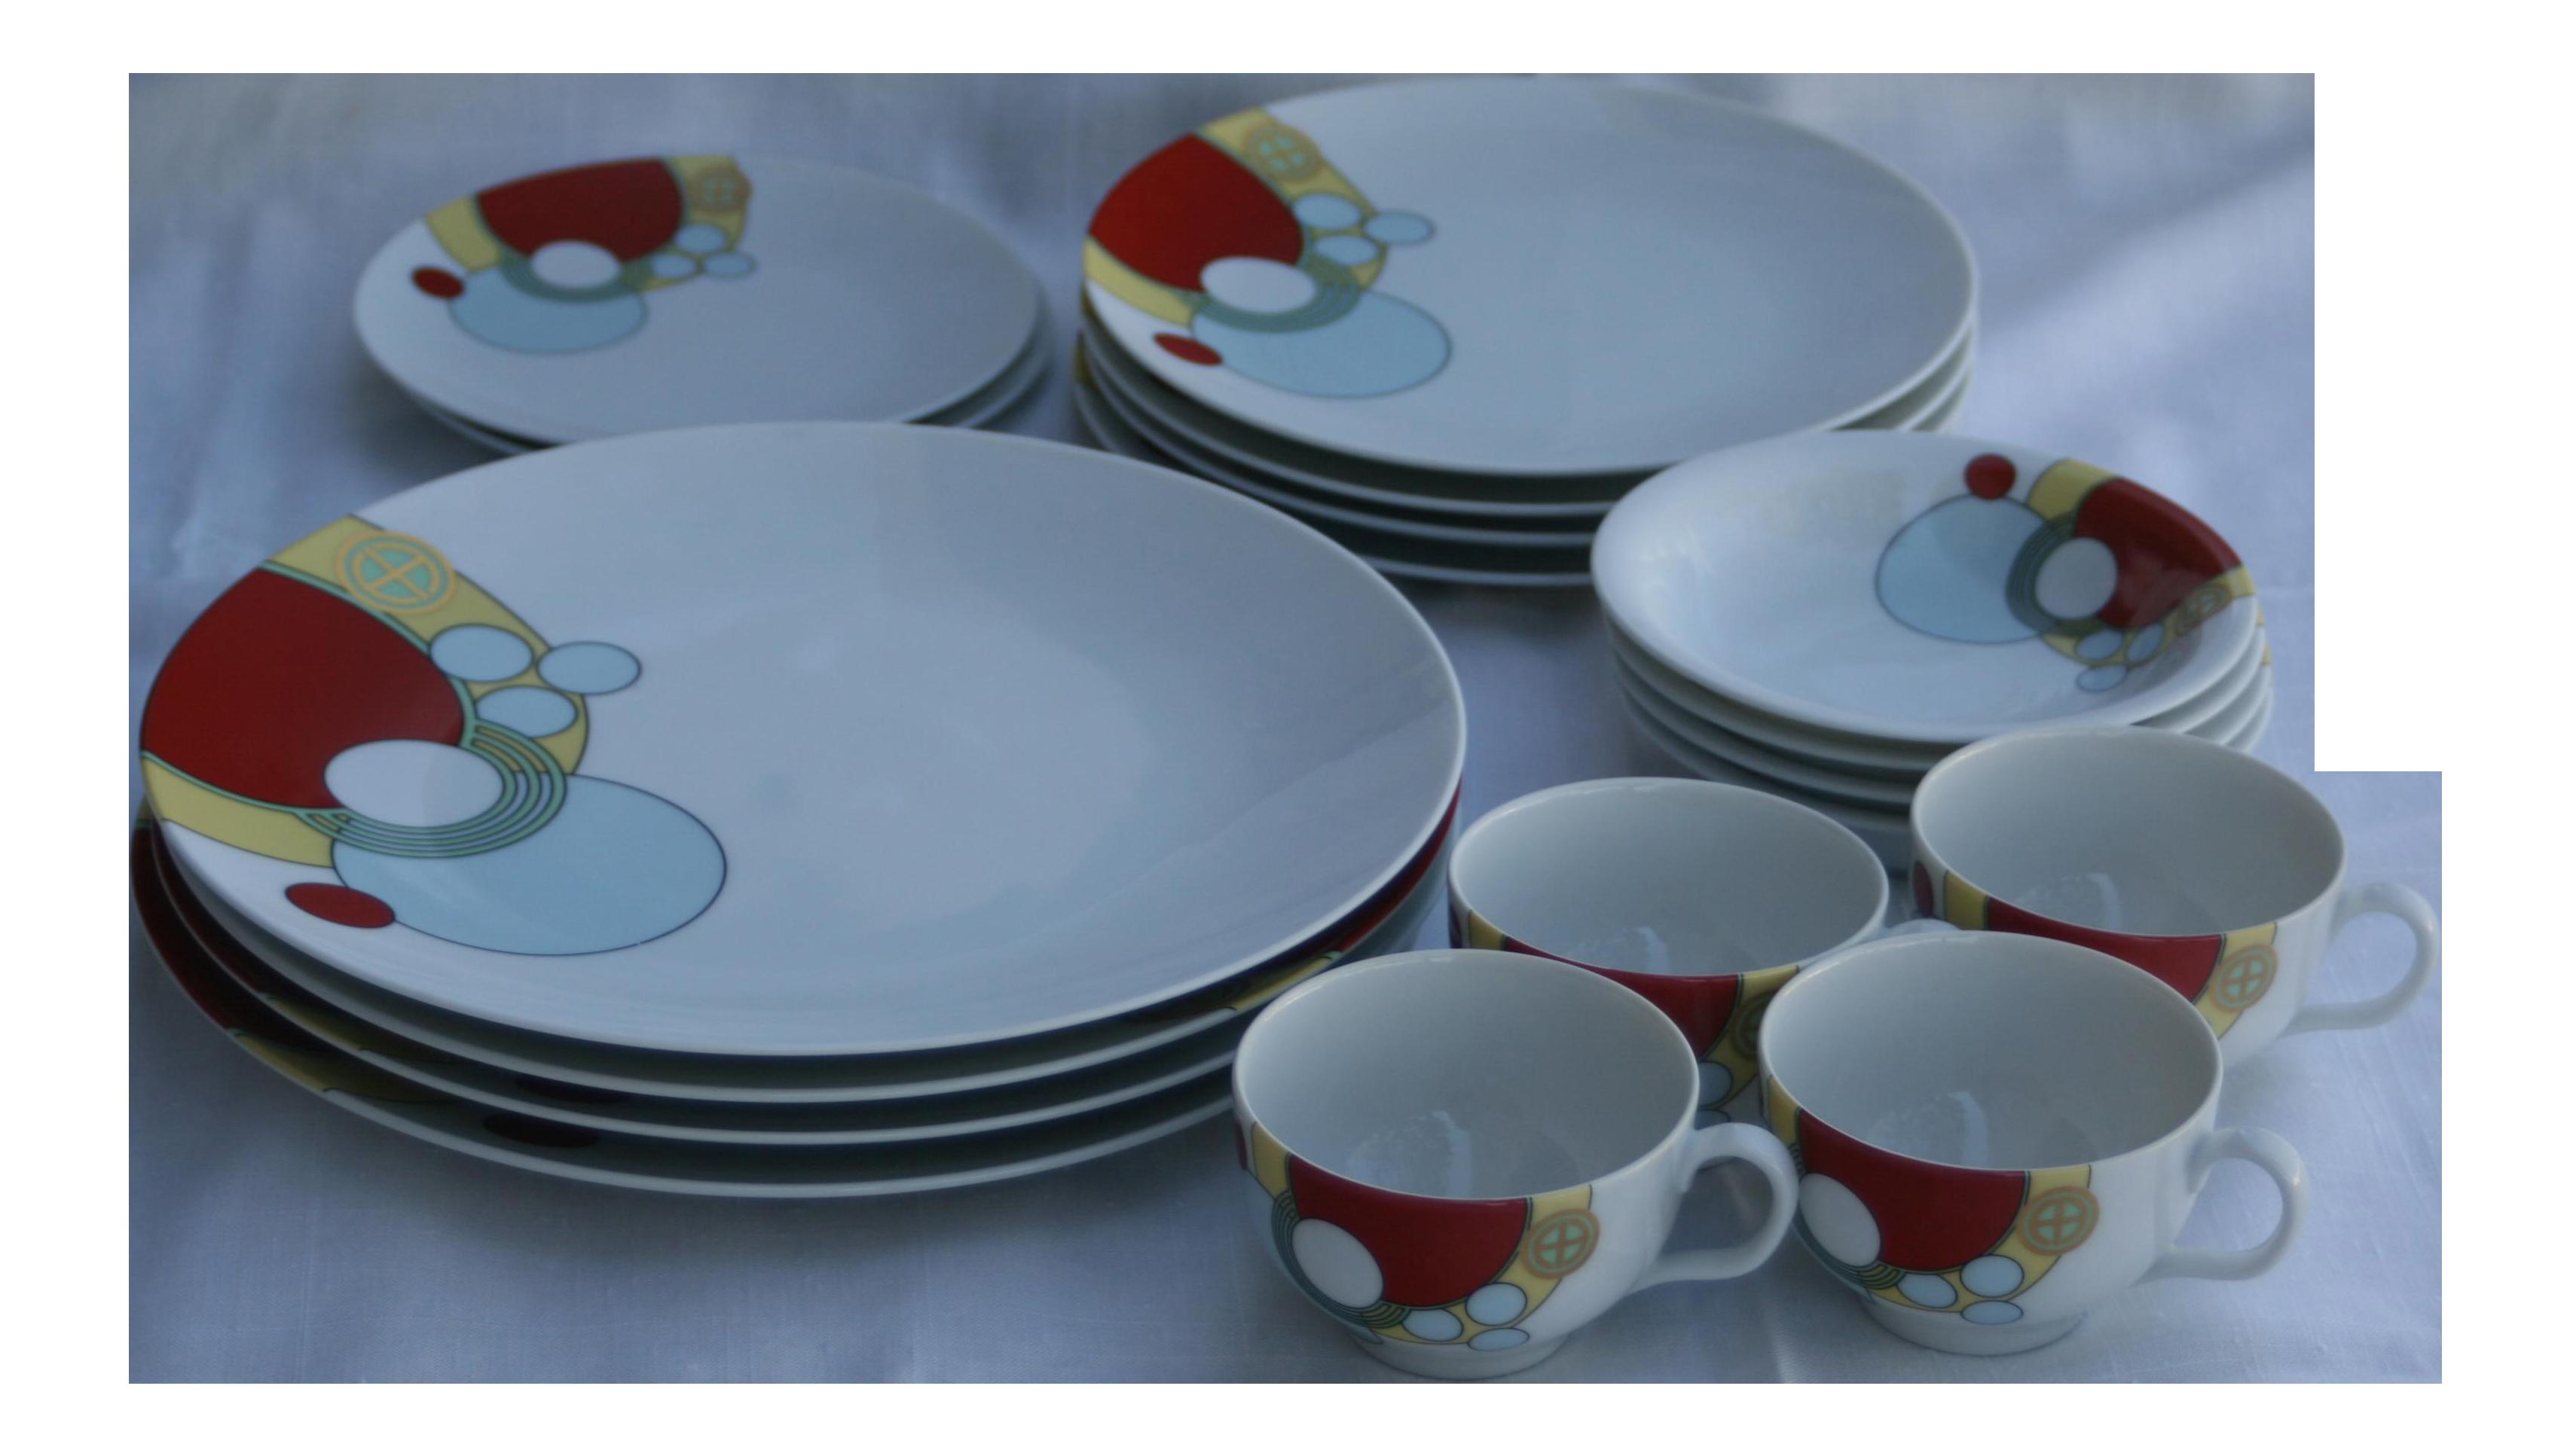 Frank Lloyd Wright for Noritake Imperial Hotel Dinnerware - 18 Pc. - Image 1 of  sc 1 st  Chairish & Frank Lloyd Wright for Noritake Imperial Hotel Dinnerware - 18 Pc ...